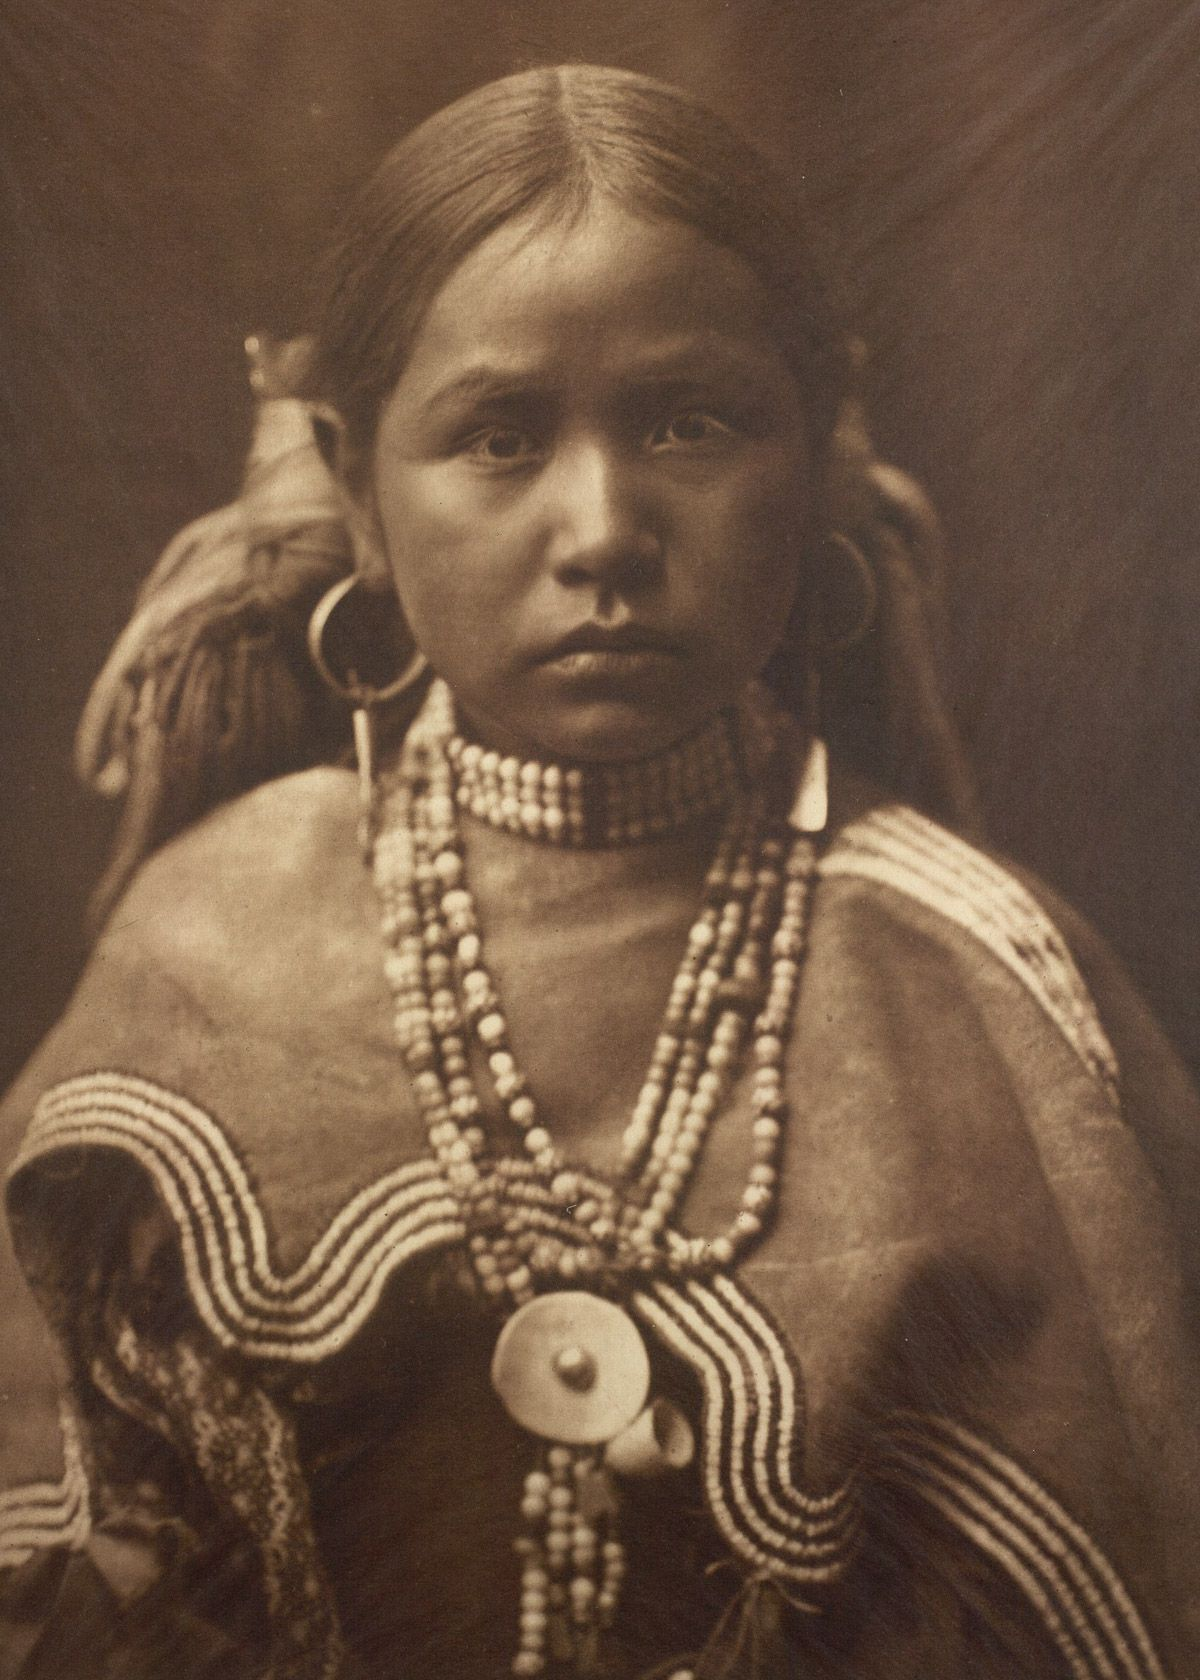 A Jicarrilla girl,  c.1910  ©EDWARD S. CURTIS/SMITHSONIAN INSTITUTION